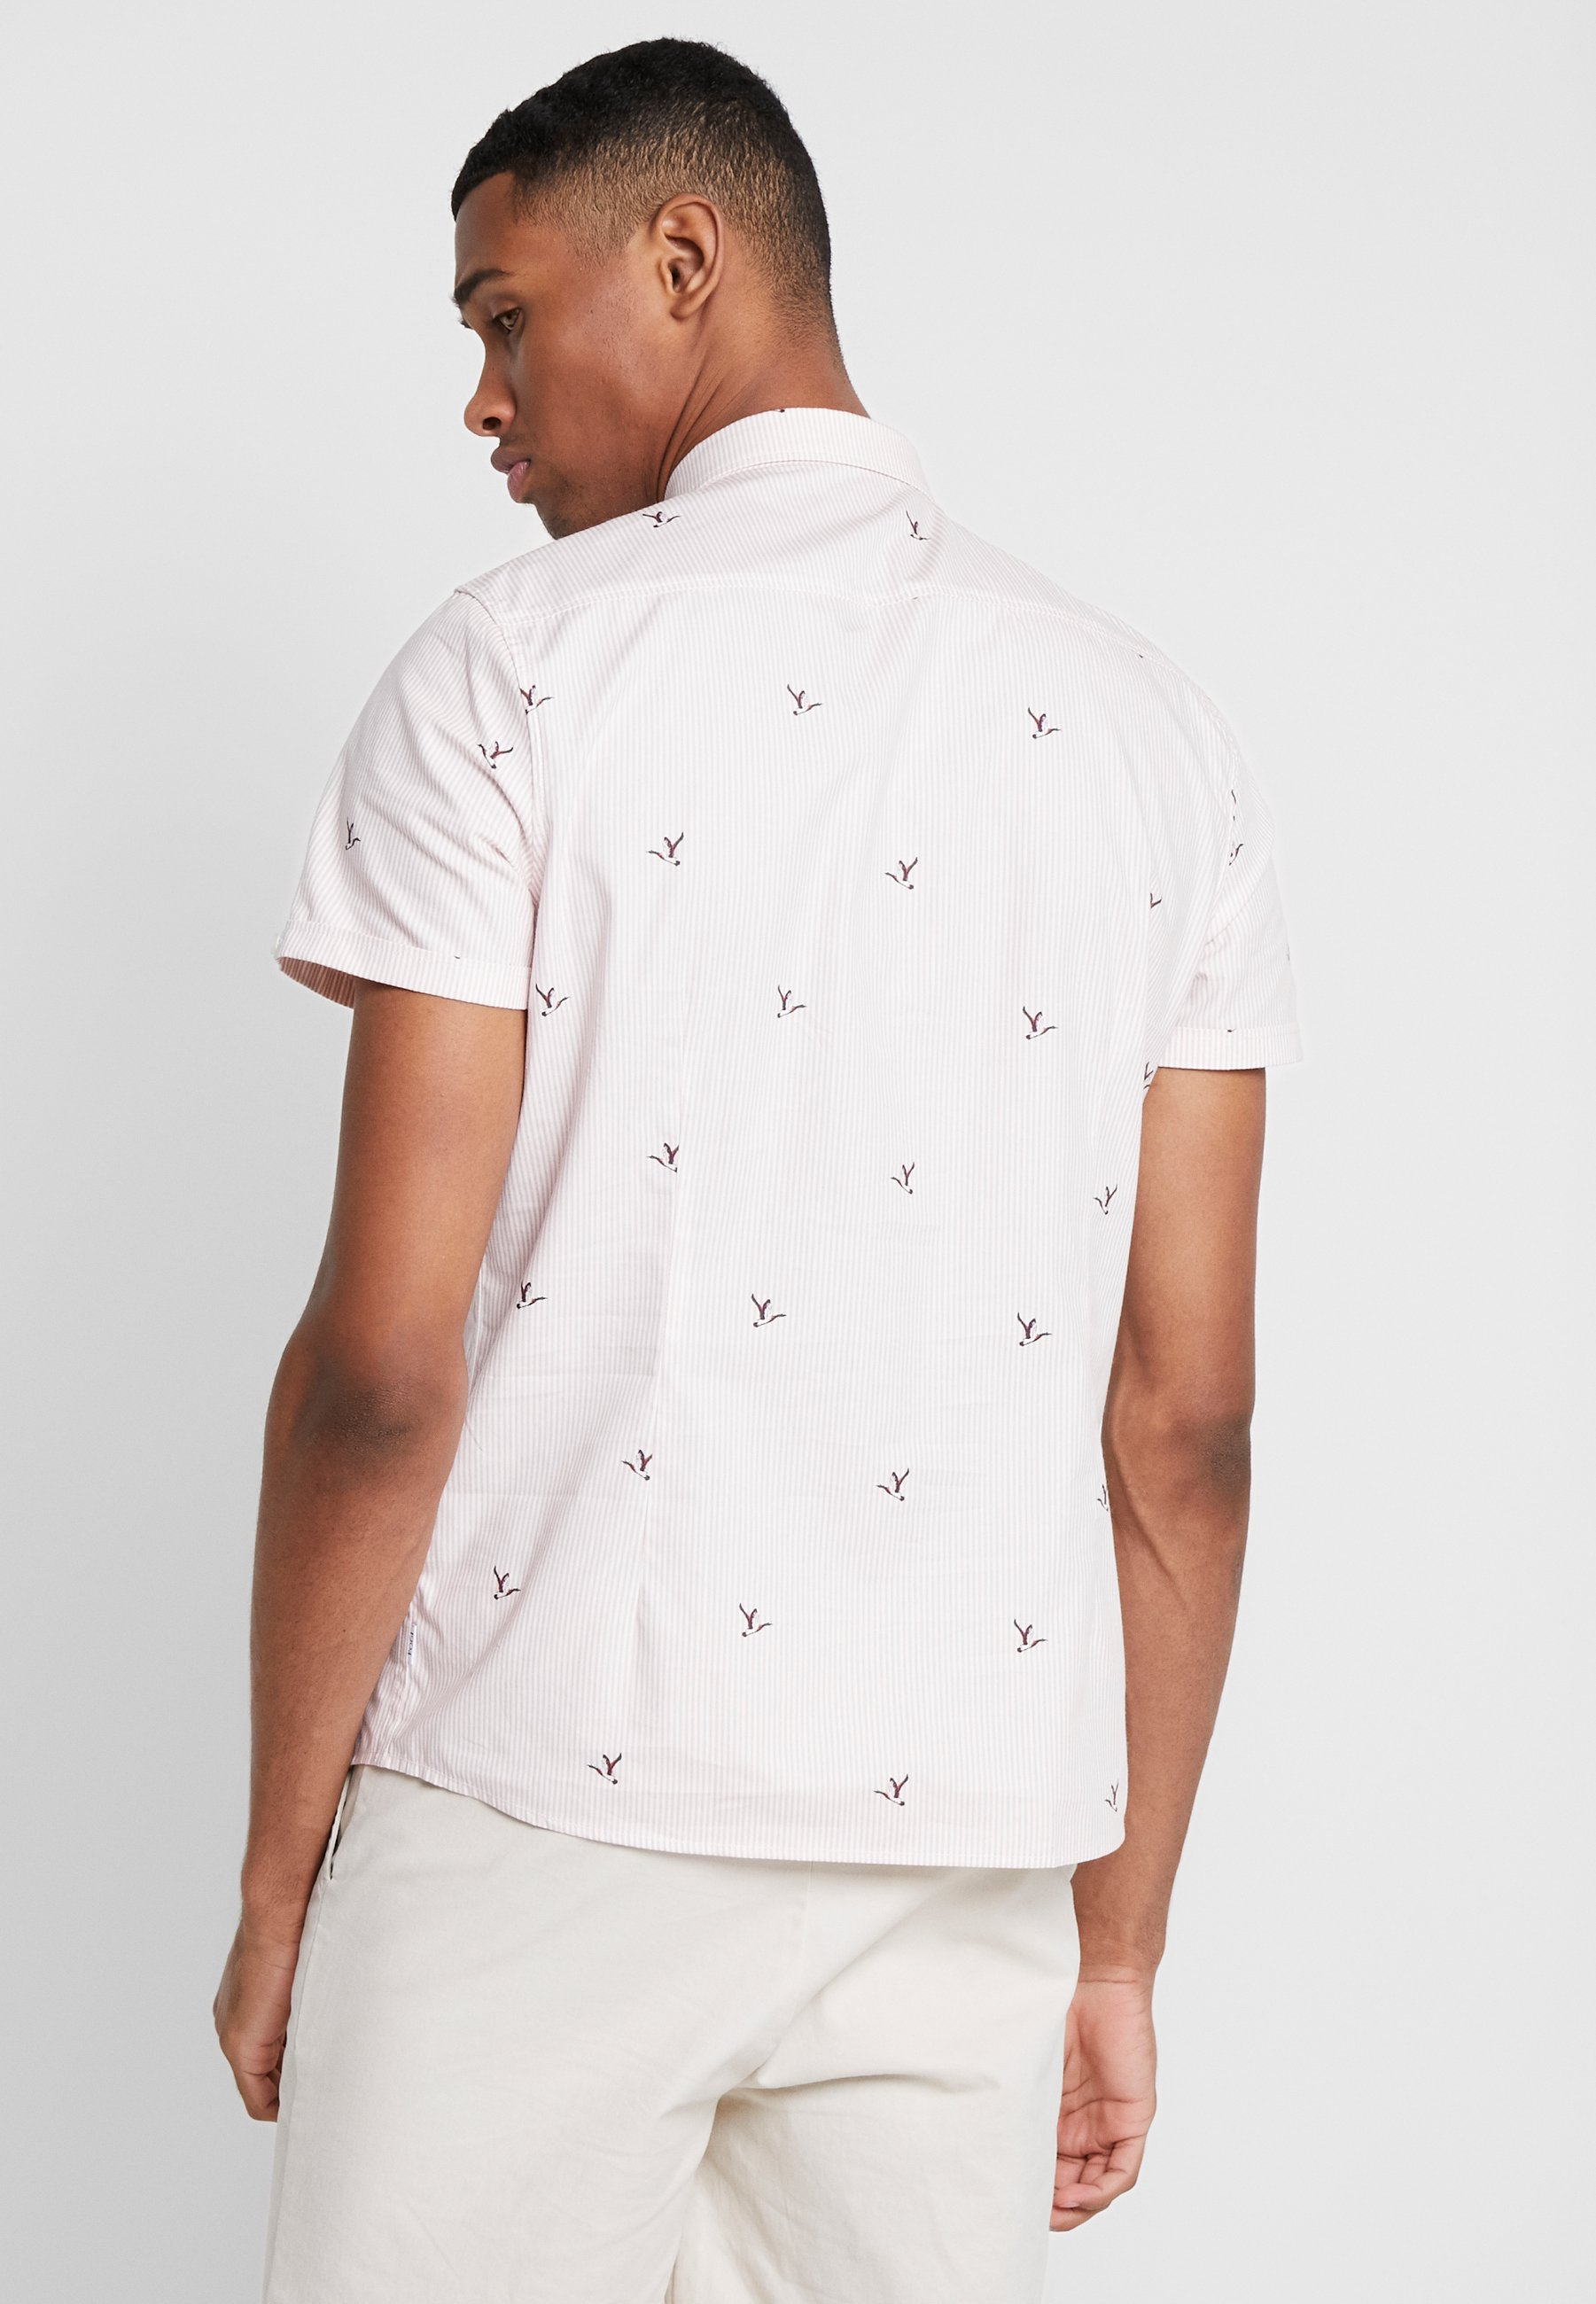 Curran 1904 Duck Imprimé Pink shirt ShirtT 5AR4Lj